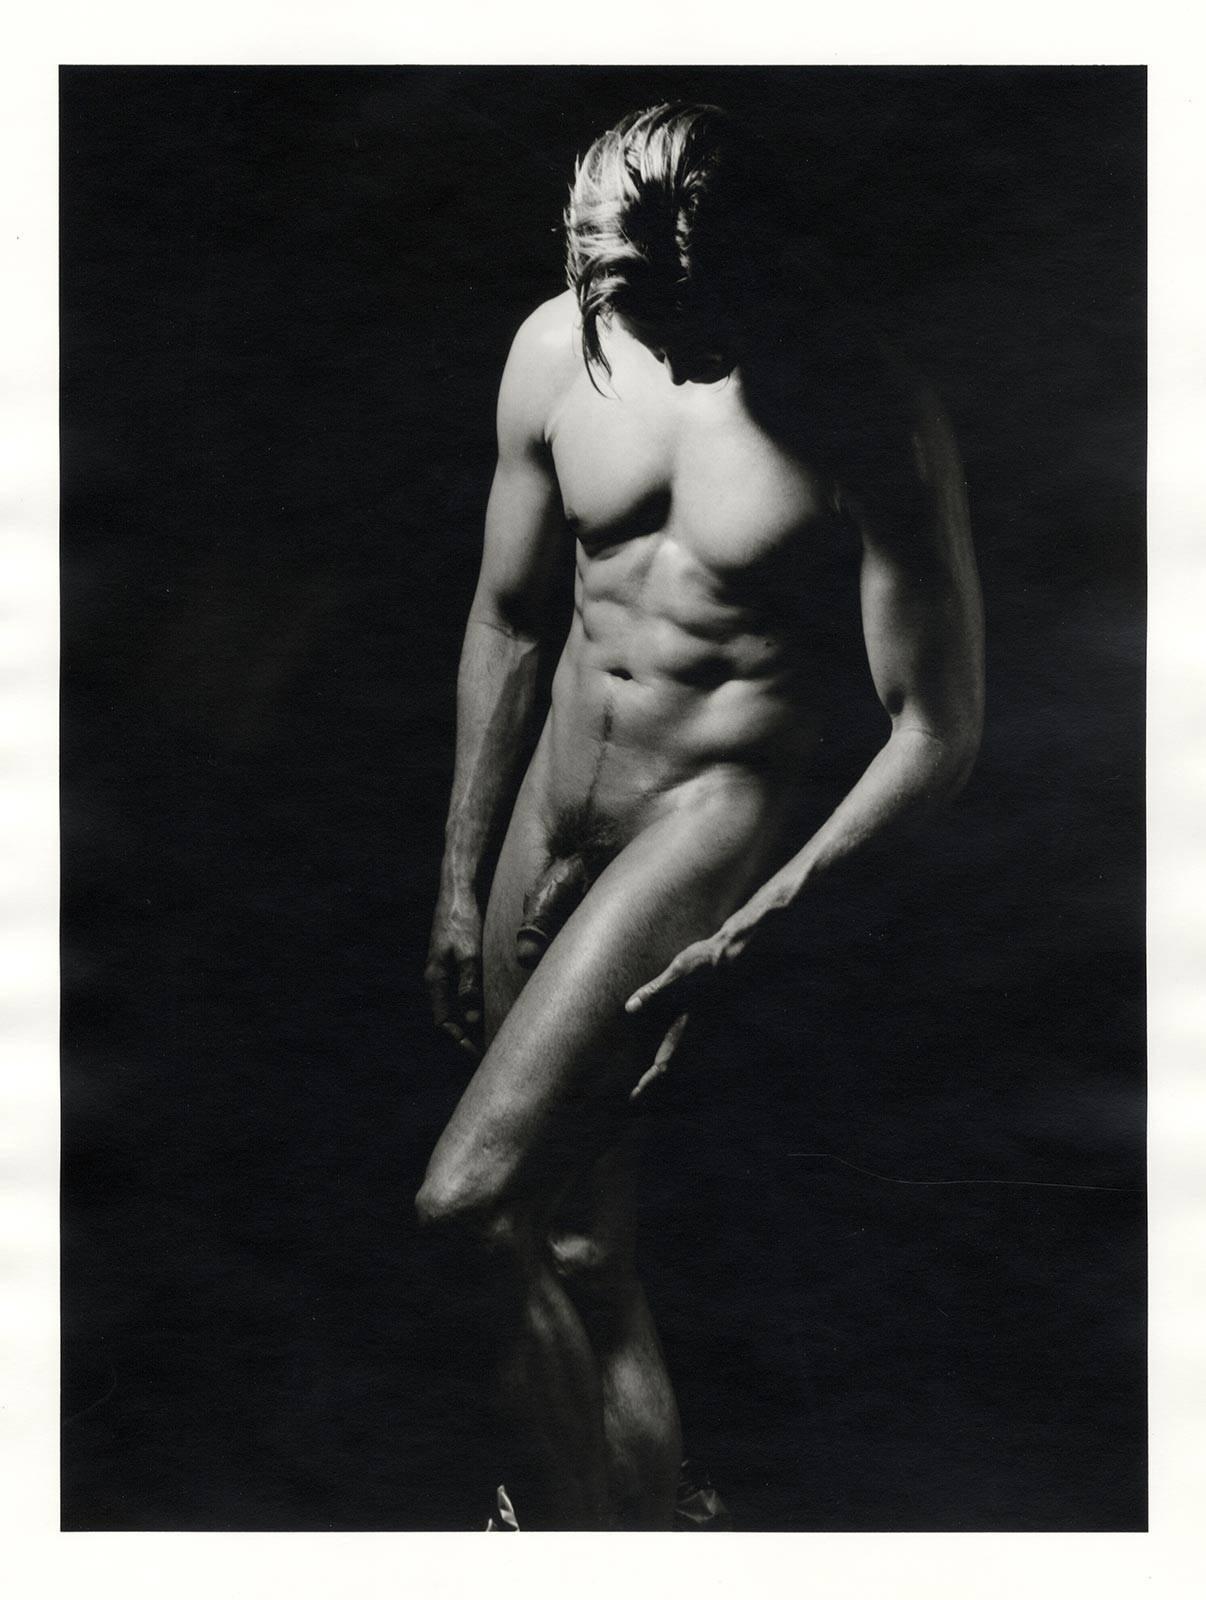 Photographers taking erotic male photos